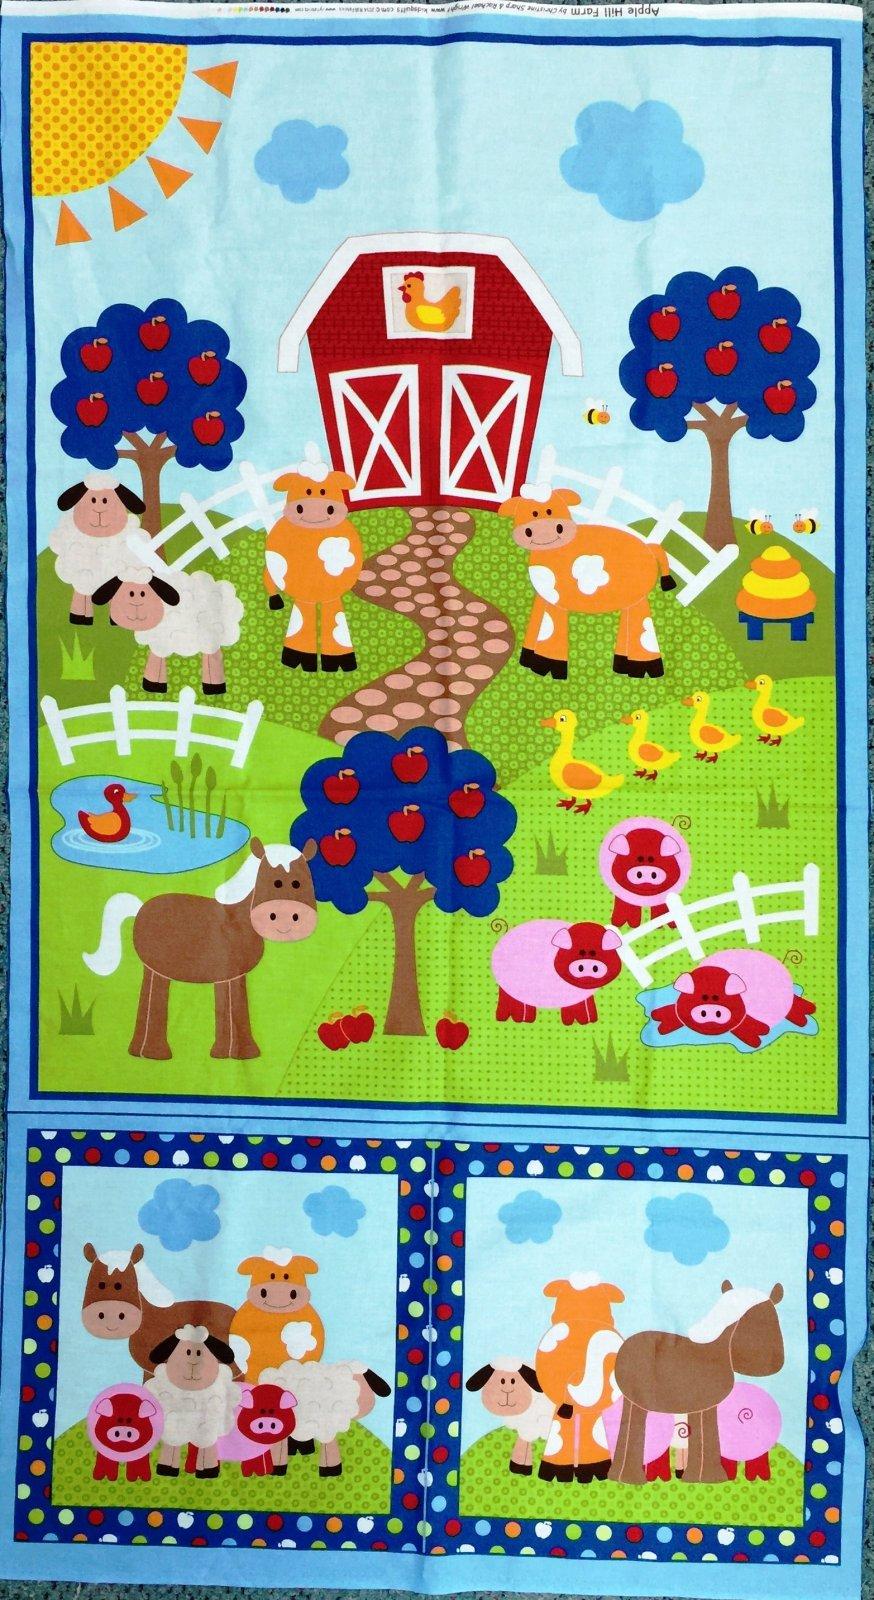 Apple Hill Farms Panel